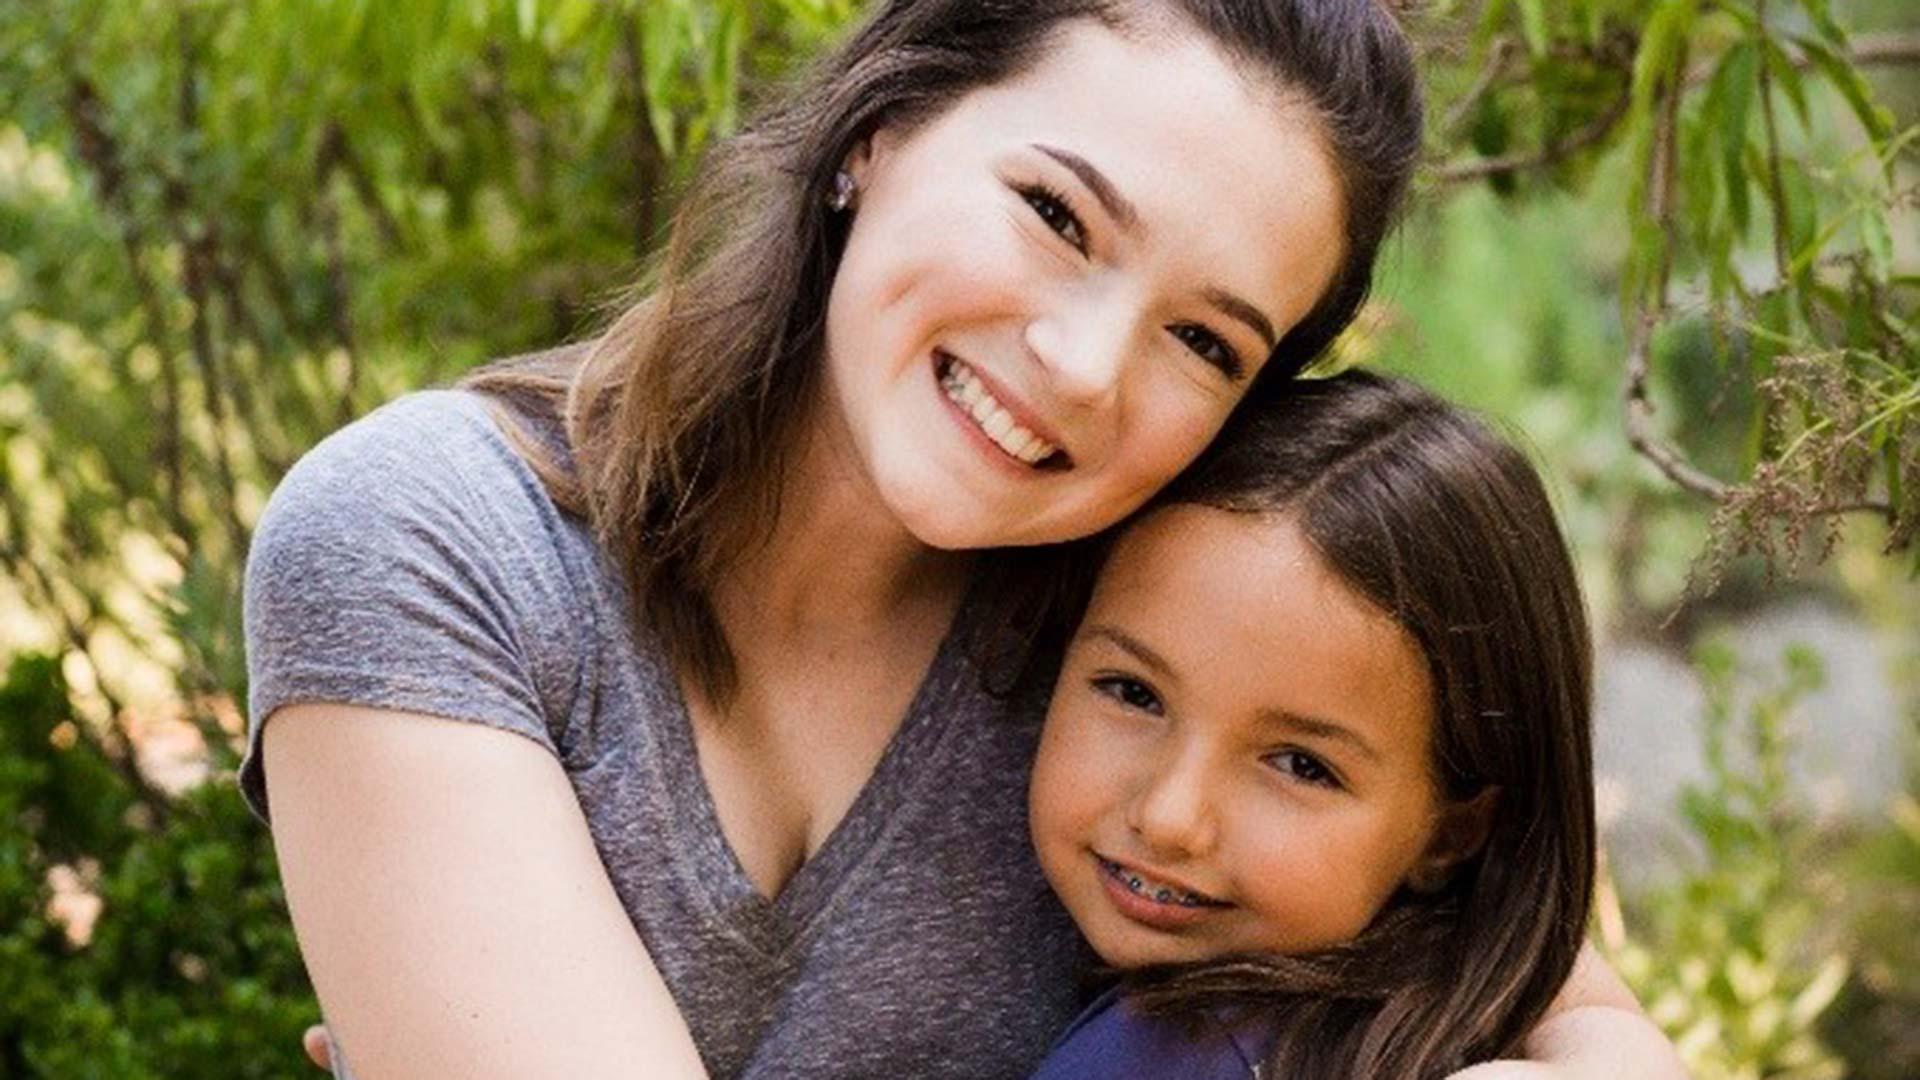 Samantha and Brooke